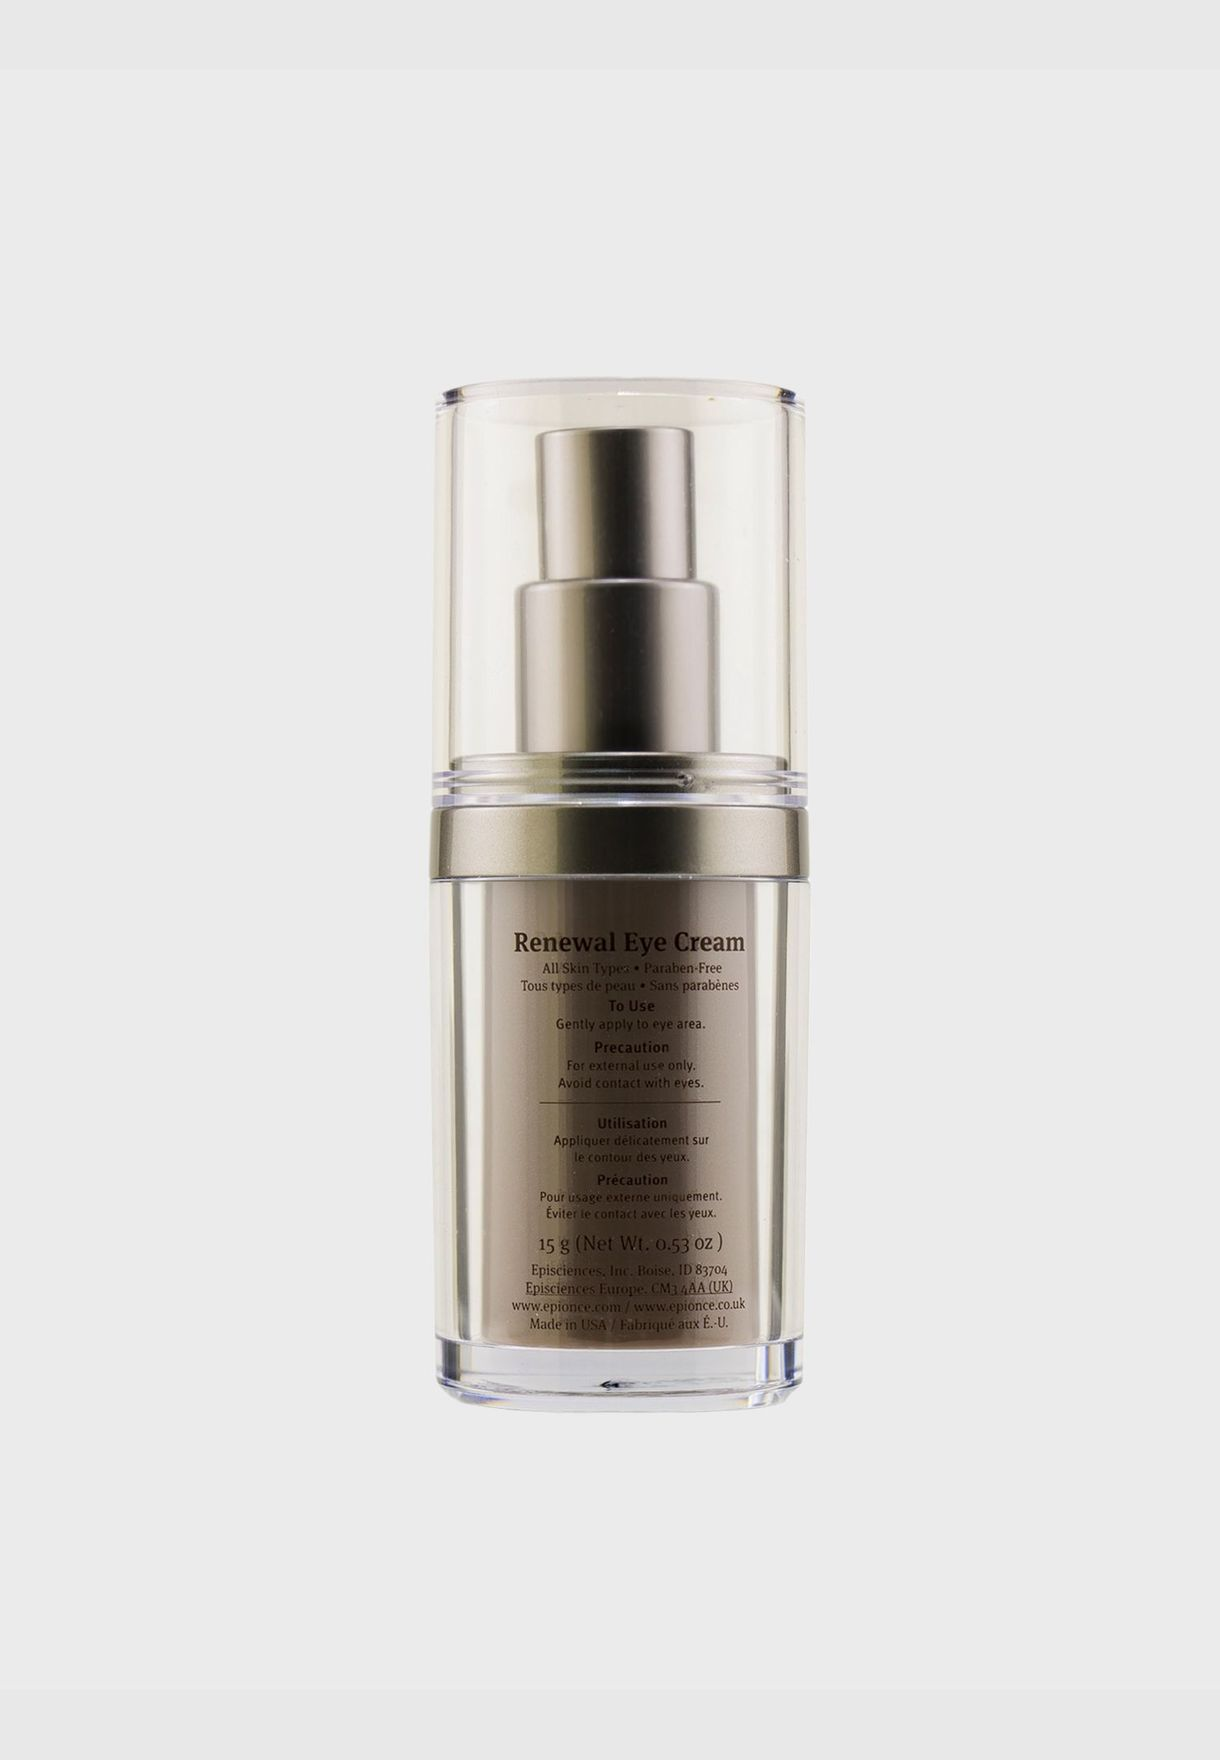 Renewal Eye Cream - For All Skin Types